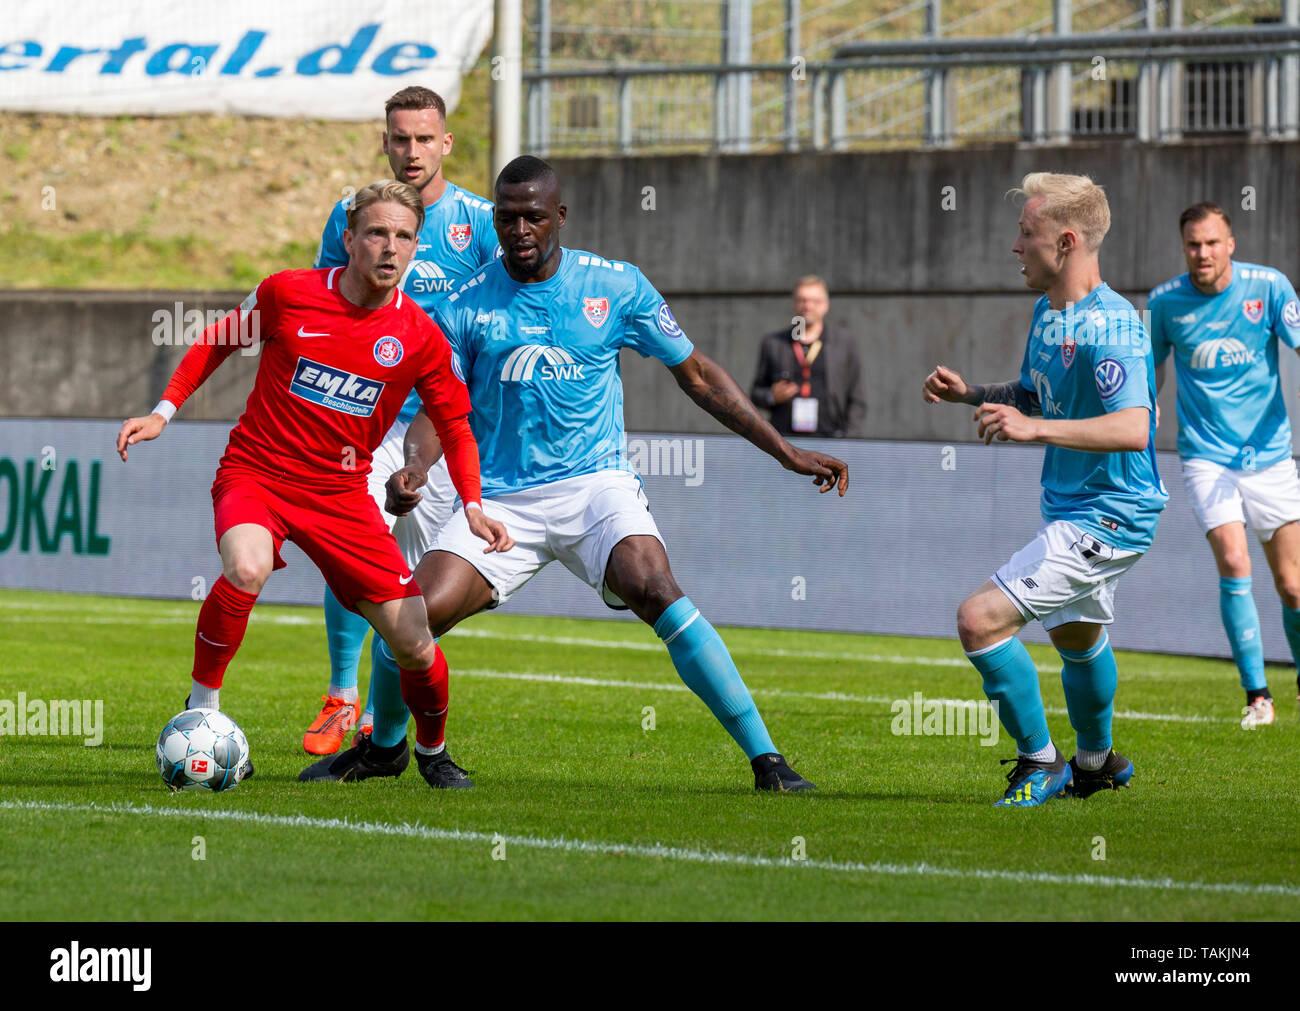 Sport, Fussball, Reviersport Niederrheinpokal, 2018/2019, Finale, Wuppertaler SV vs. KFC Uerdingen 1-2, Stadion Am Zoo in Wuppertal, Spielszene, v.l.n.r. Kevin Hagemann (WSV), Manuel Konrad (KFC), Assani Lukimya (KFC), Patrick Pfluecke (KFC), Kevin Grosskreutz (KFC), sports, football, Lower Rhine Cup, 2018/2019, final, Wuppertaler SV vs. KFC Uerdingen 1-2, Stadium Am Zoo in Wuppertal, scene of the match, f.l.t.r. Kevin Hagemann (WSV), Manuel Konrad (KFC), Assani Lukimya (KFC), Patrick Pfluecke (KFC), Kevin Grosskreutz (KFC) *** Local Caption *** sports, football, Lower Rhine Cup, 2018/2019, fi - Stock Image